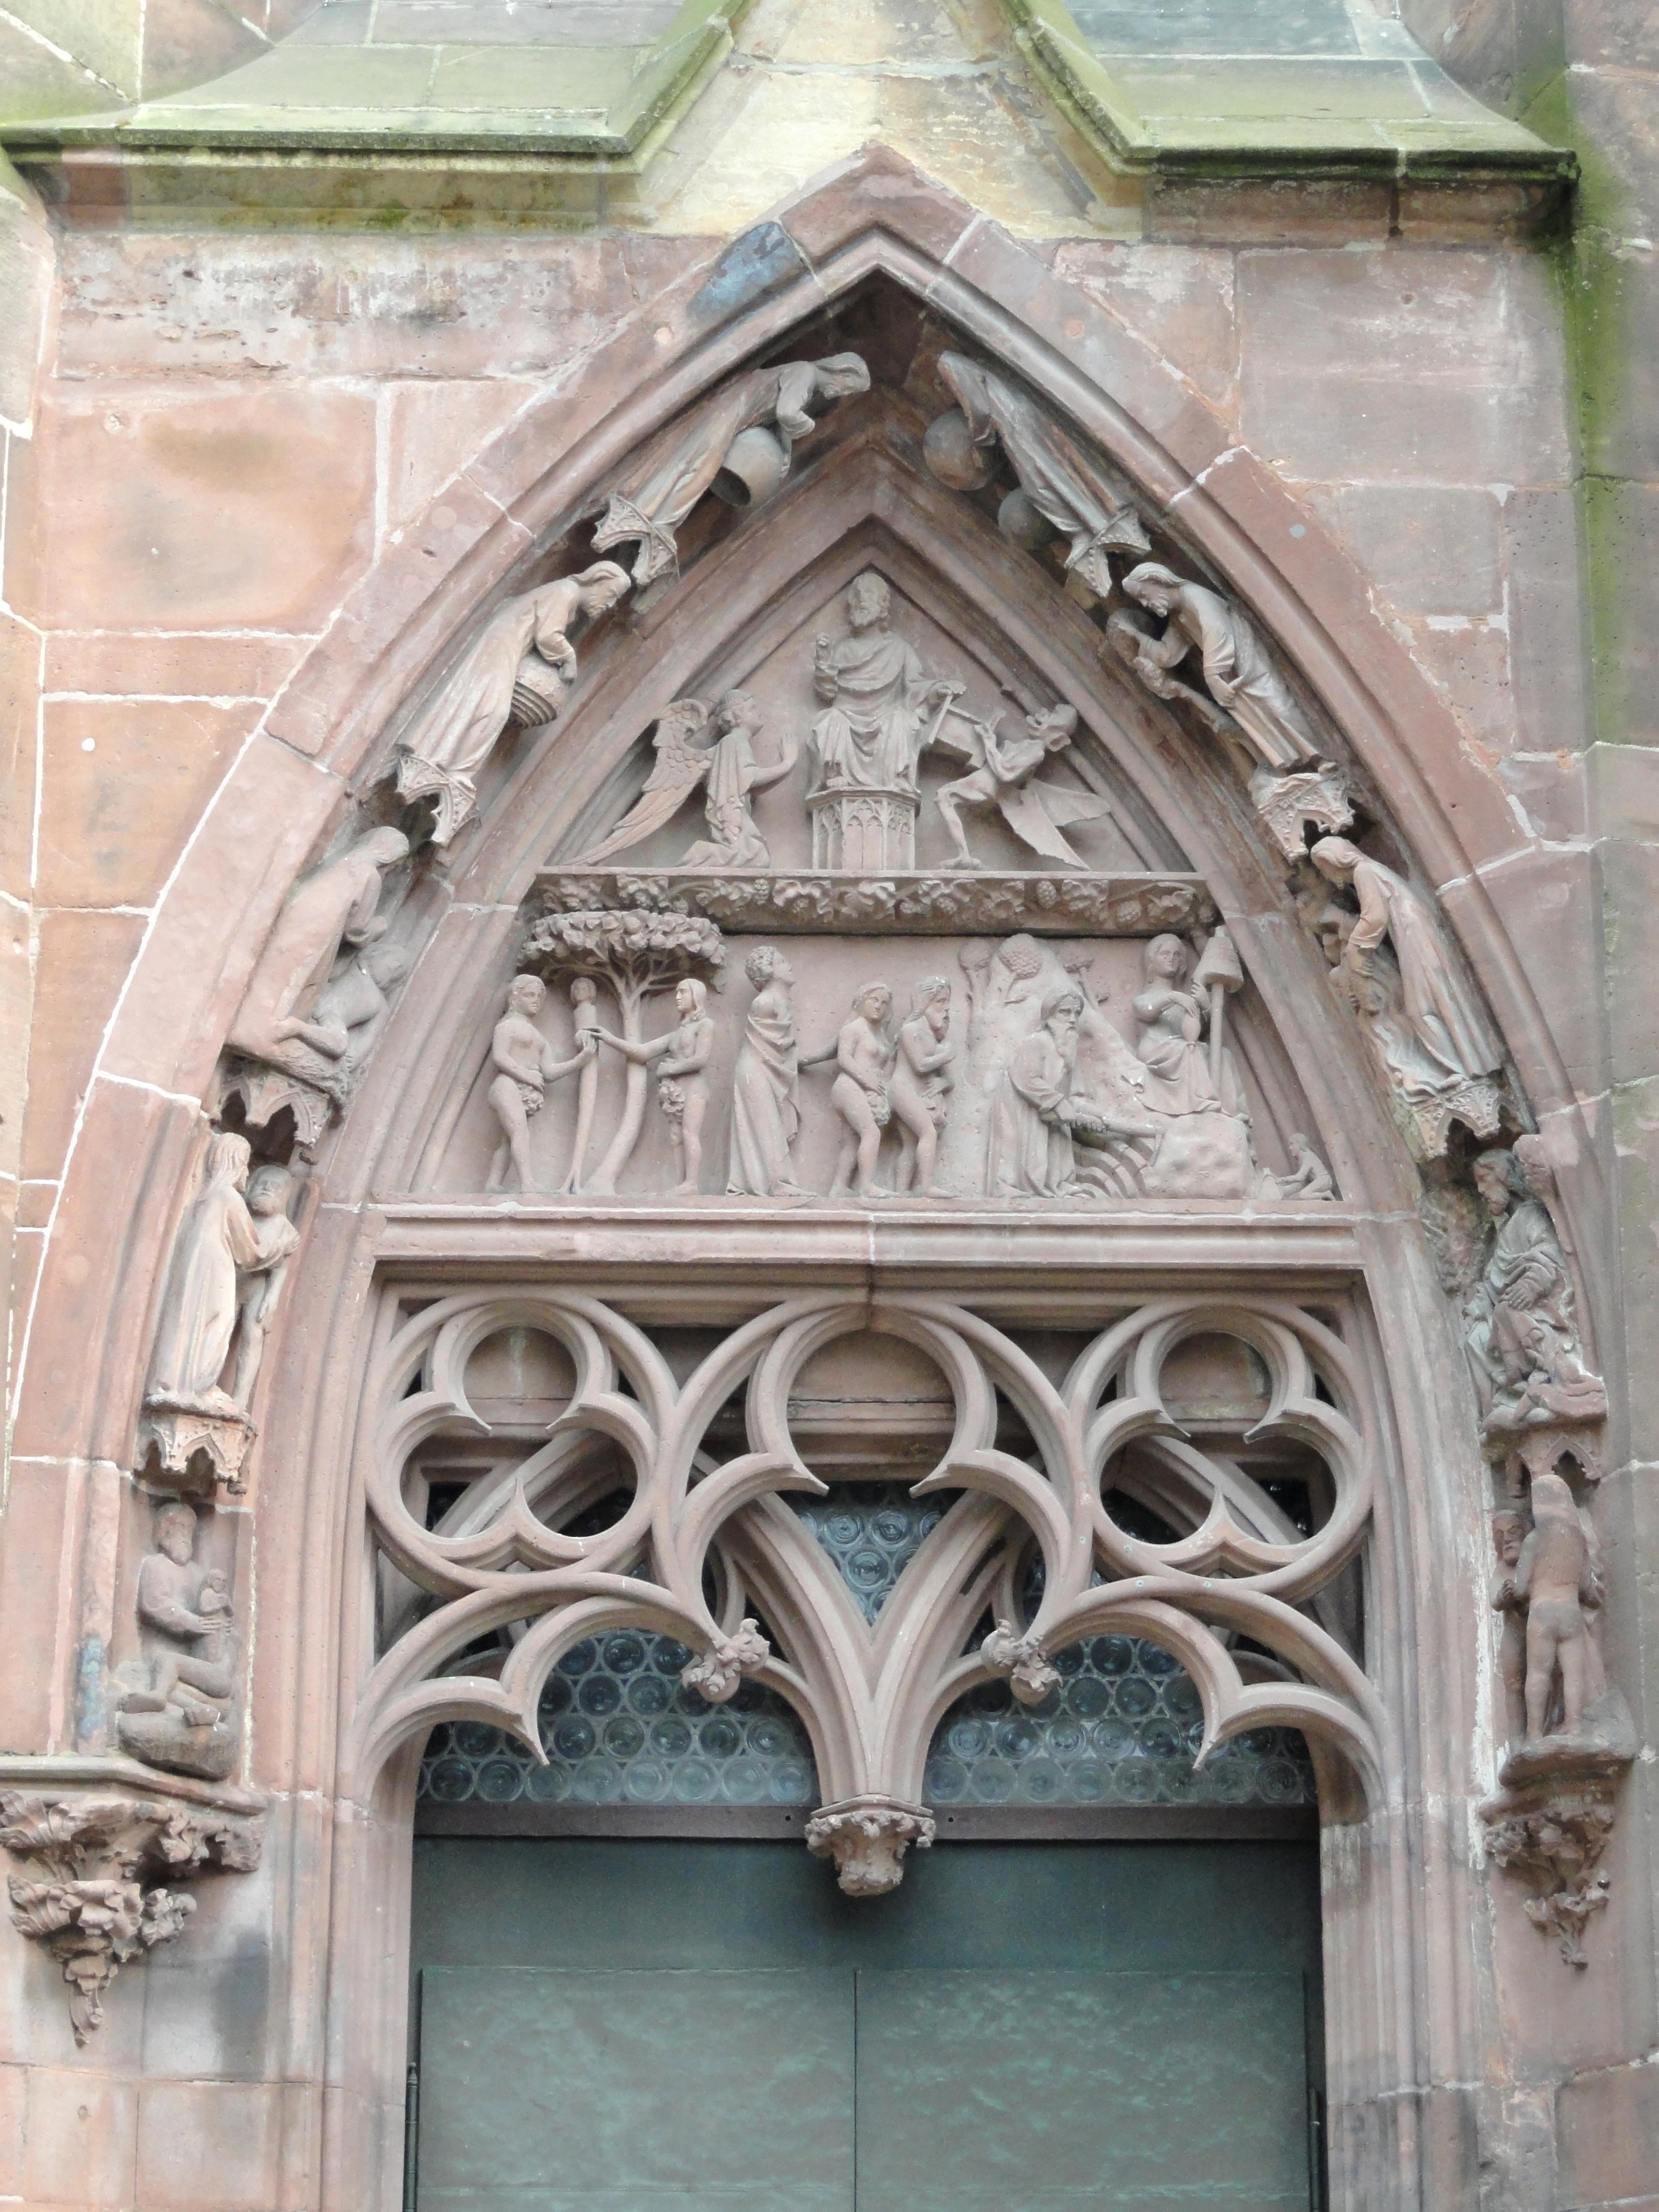 Das Schöpfungsportal am Freiburger Münster. Quelle Wikicommons, Nutzer: Daderot, Lizenz: Creative Commons CC0 1.0 Universal Public Domain Dedication.